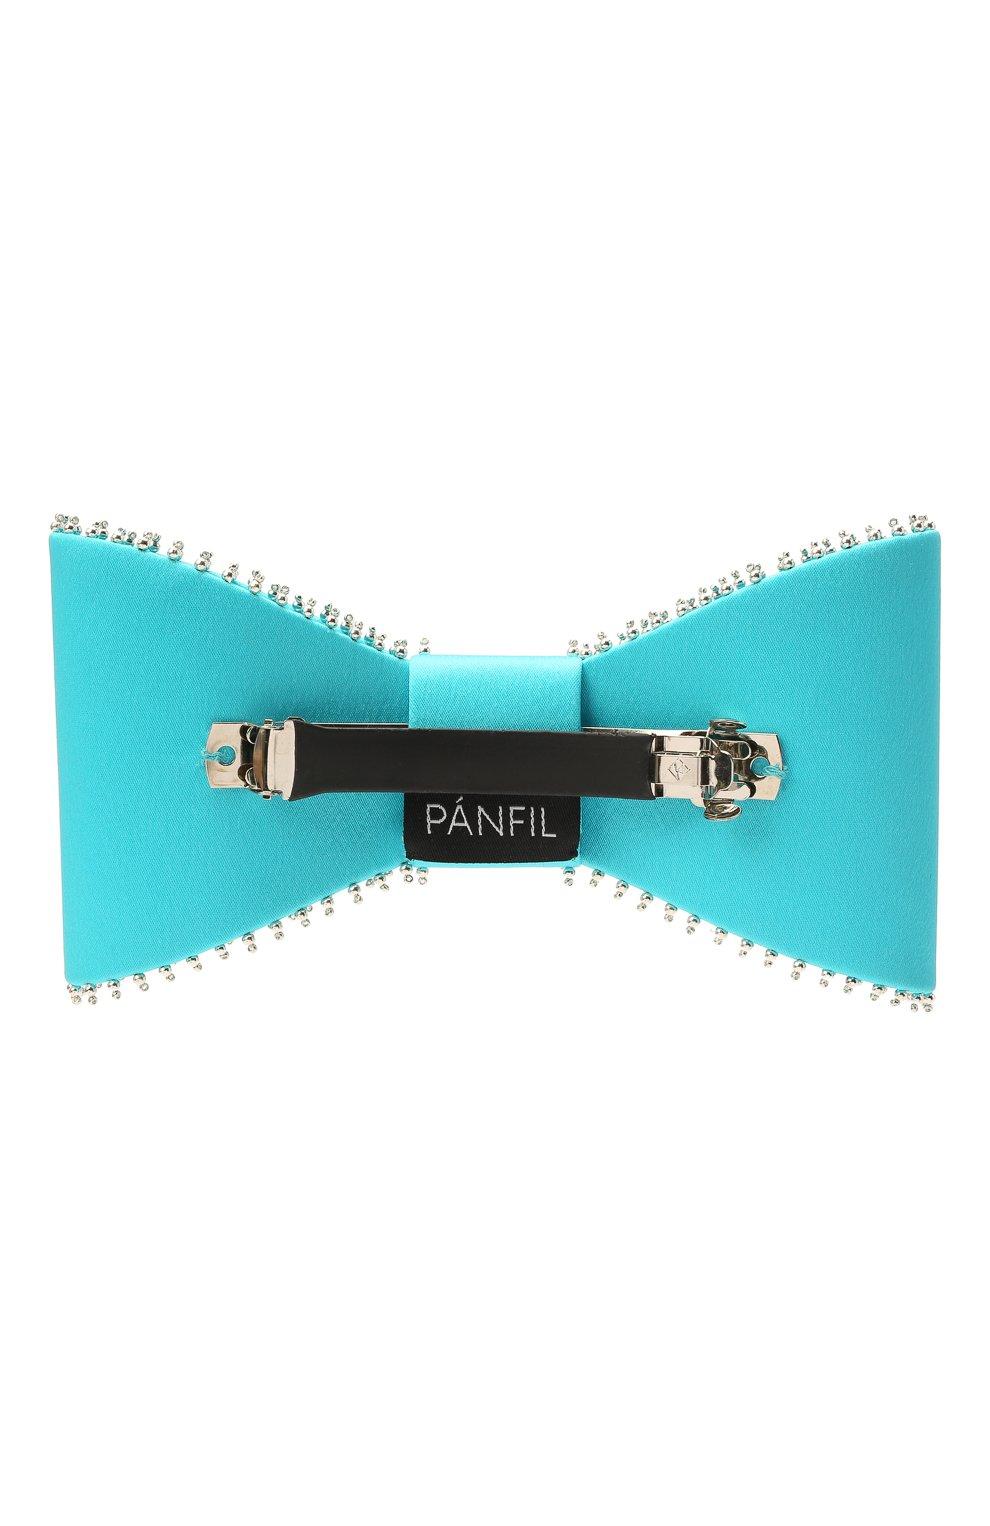 Женская бант PANFIL бирюзового цвета, арт. Бант 22-T2-TH | Фото 2 (Материал: Текстиль, Шелк)